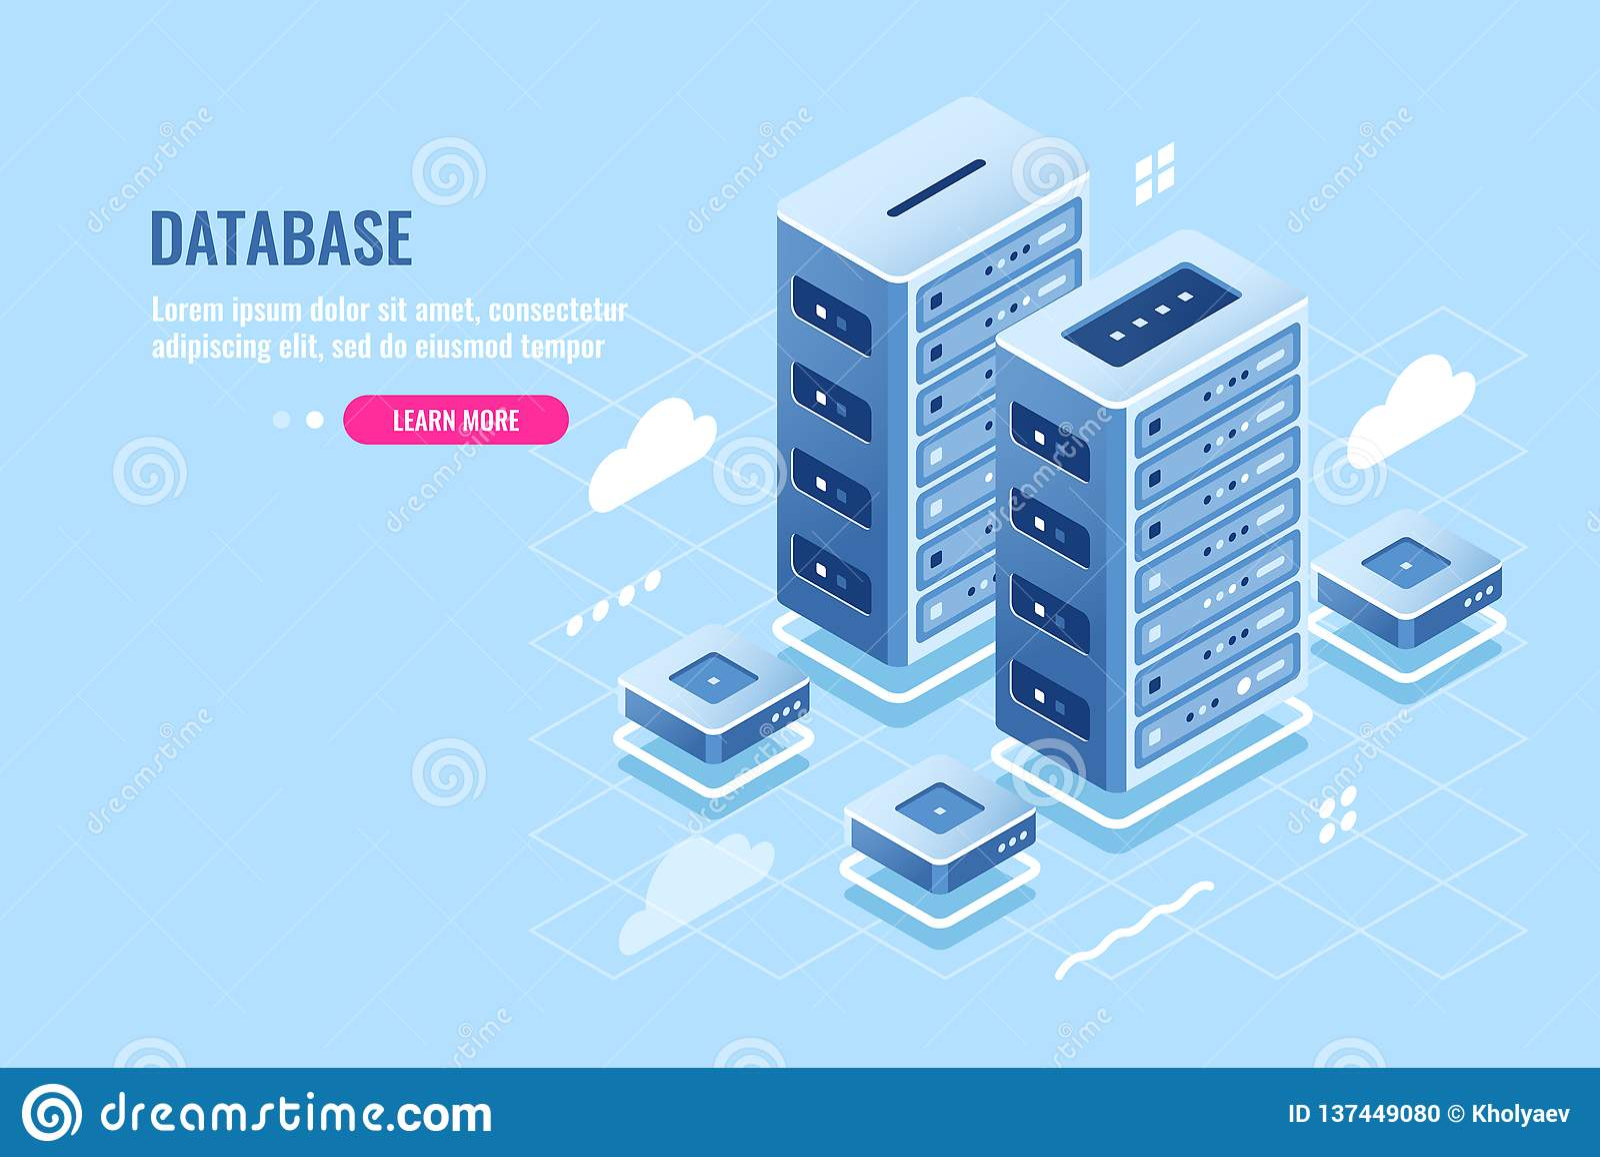 Serverruimte, website het ontvangen, wolkenopslag, database en datacentrum isometrisch pictogram, blockchain digitale technologie